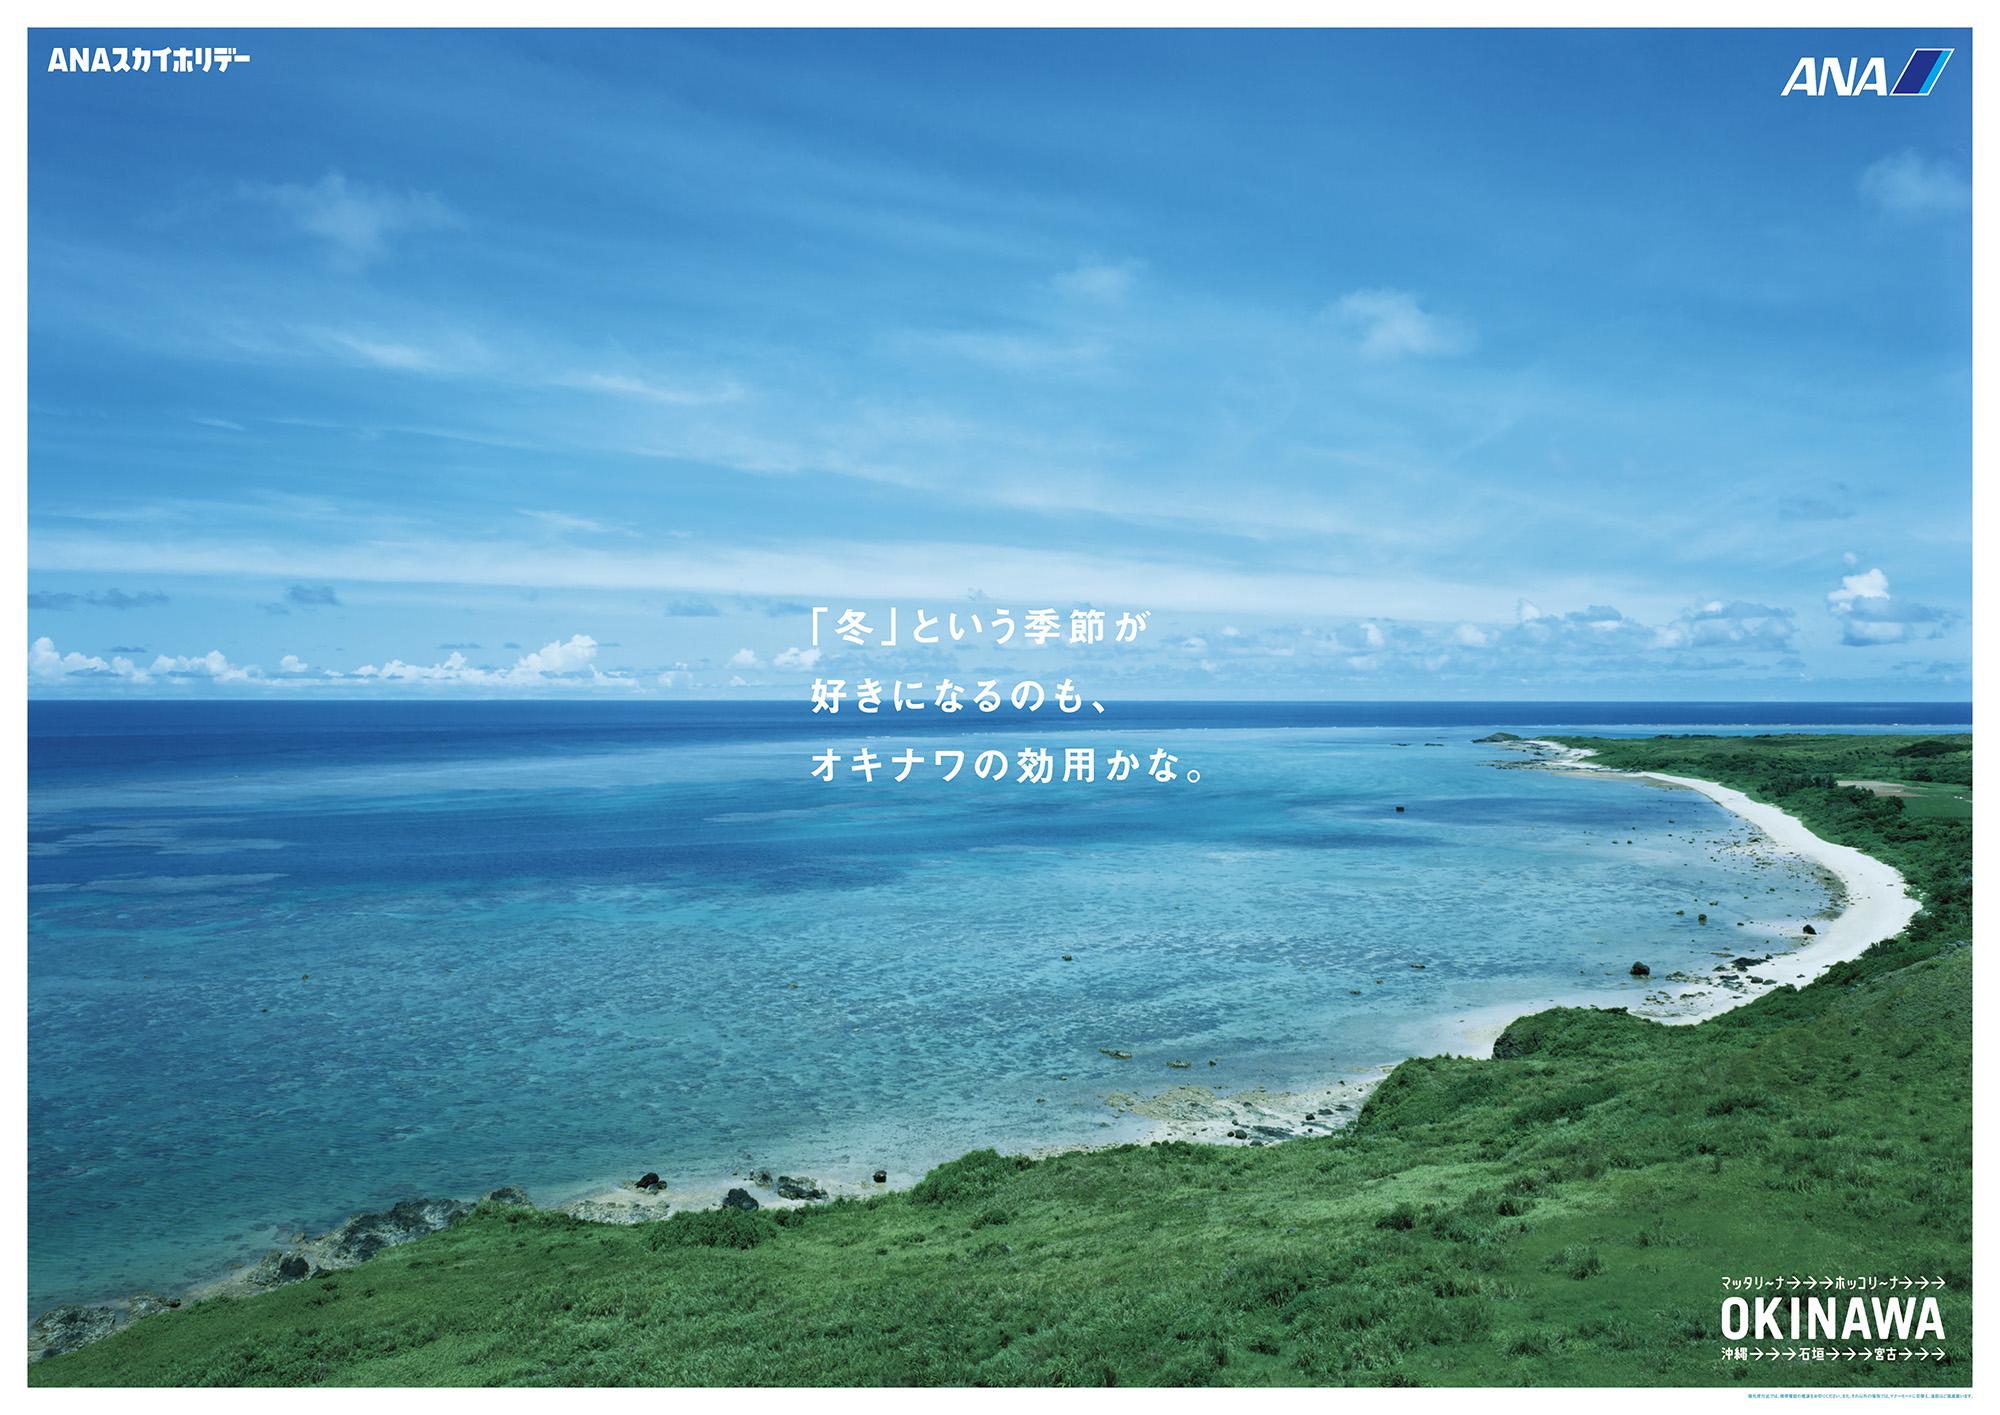 201_ana_01_平久保崎_2000px_72dpi.jpg